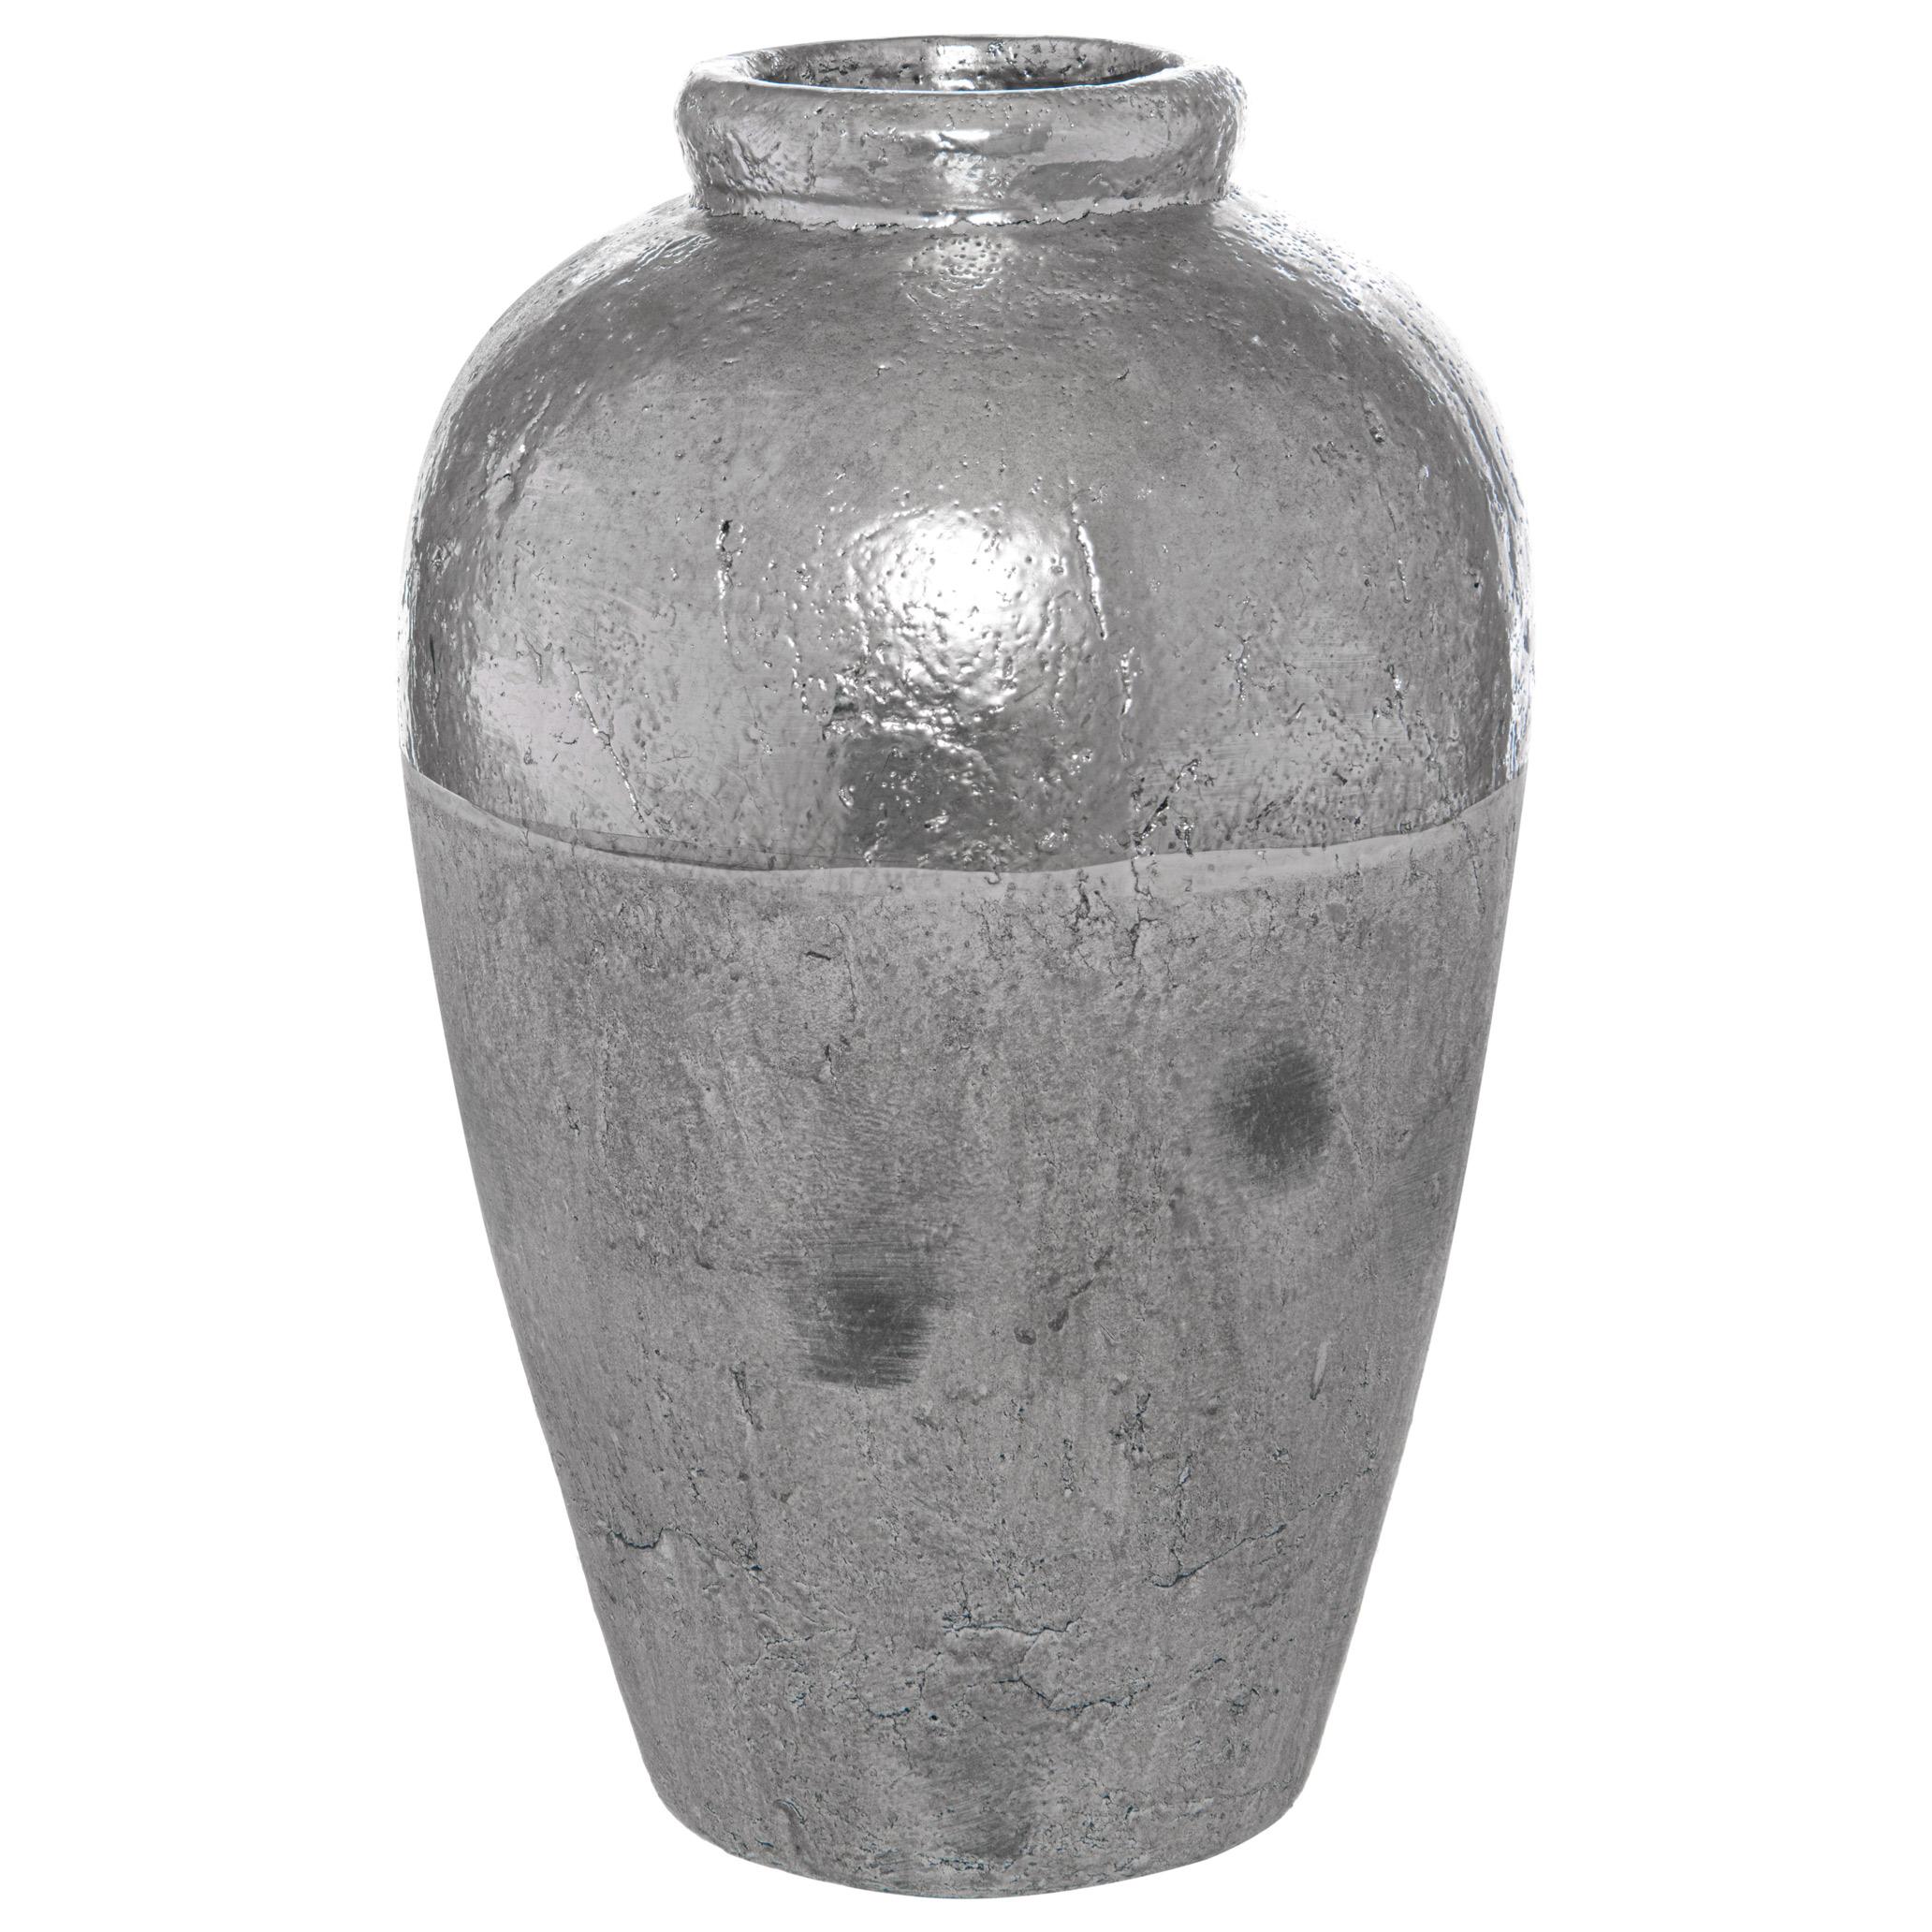 Metallic Dipped Juniper Vase - Image 1